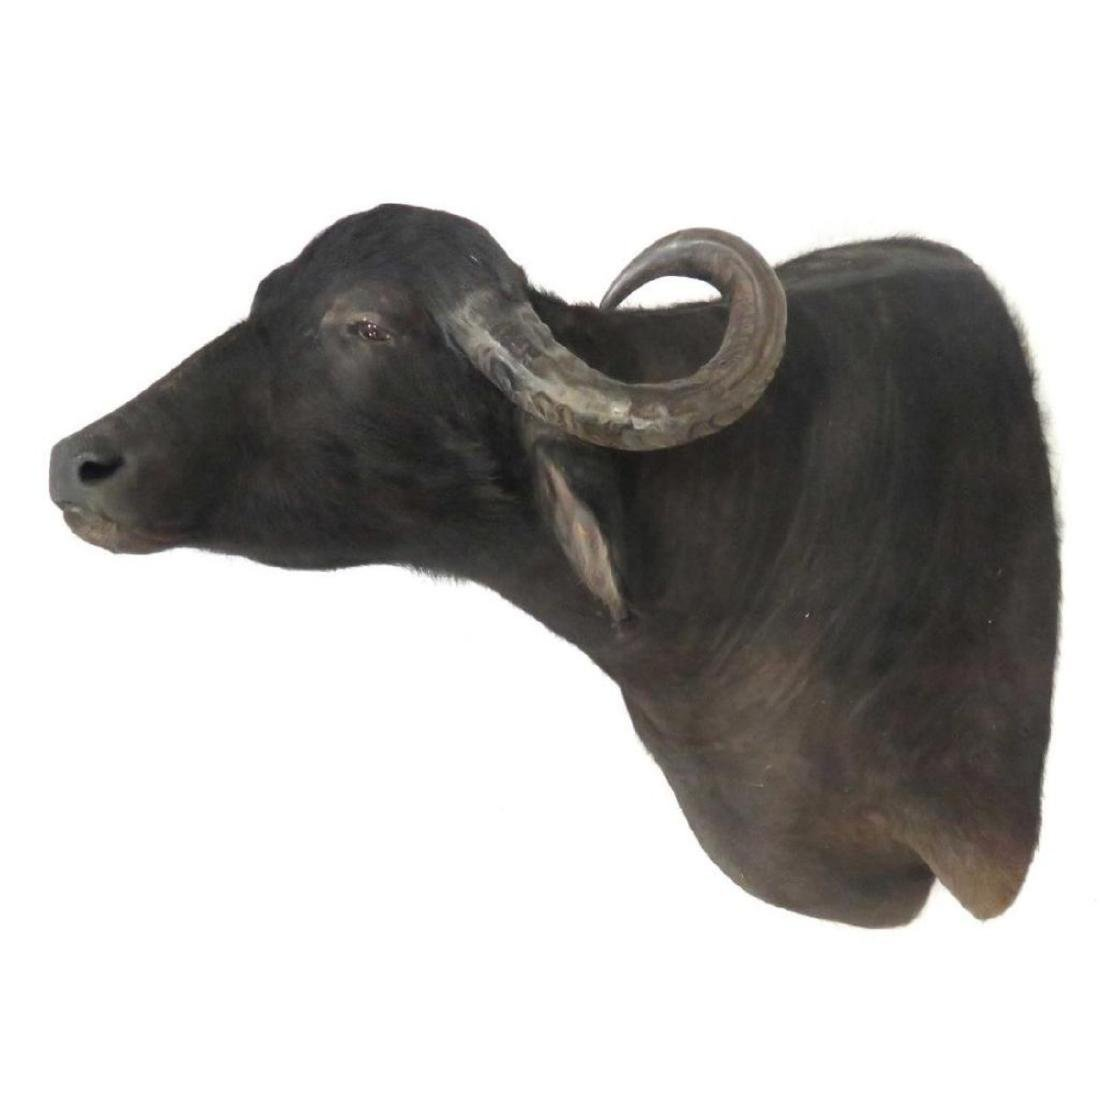 Water Buffalo Shoulder Trophy Mount - 2